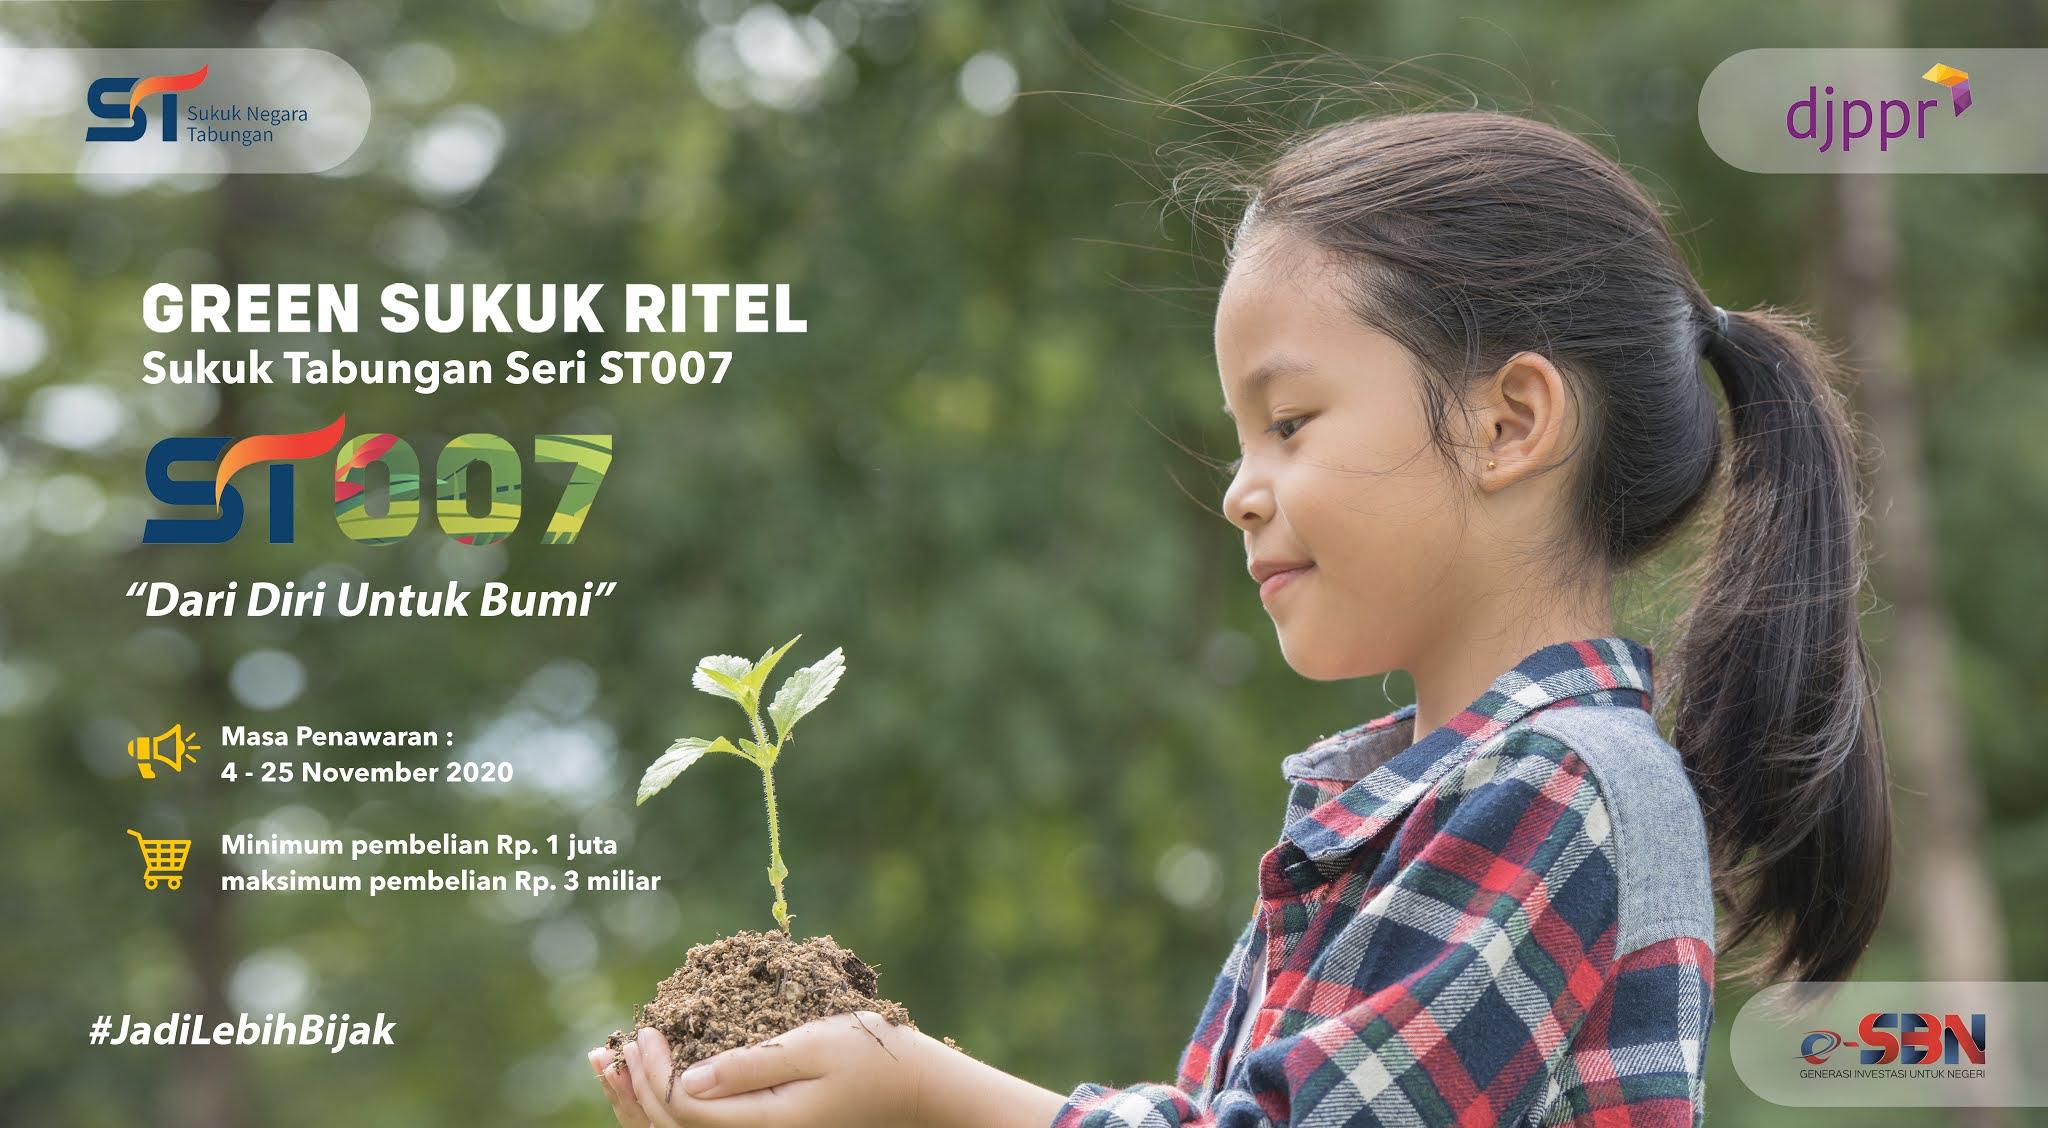 Green Sukuk Ritel – Sukuk Tabungan seri ST007